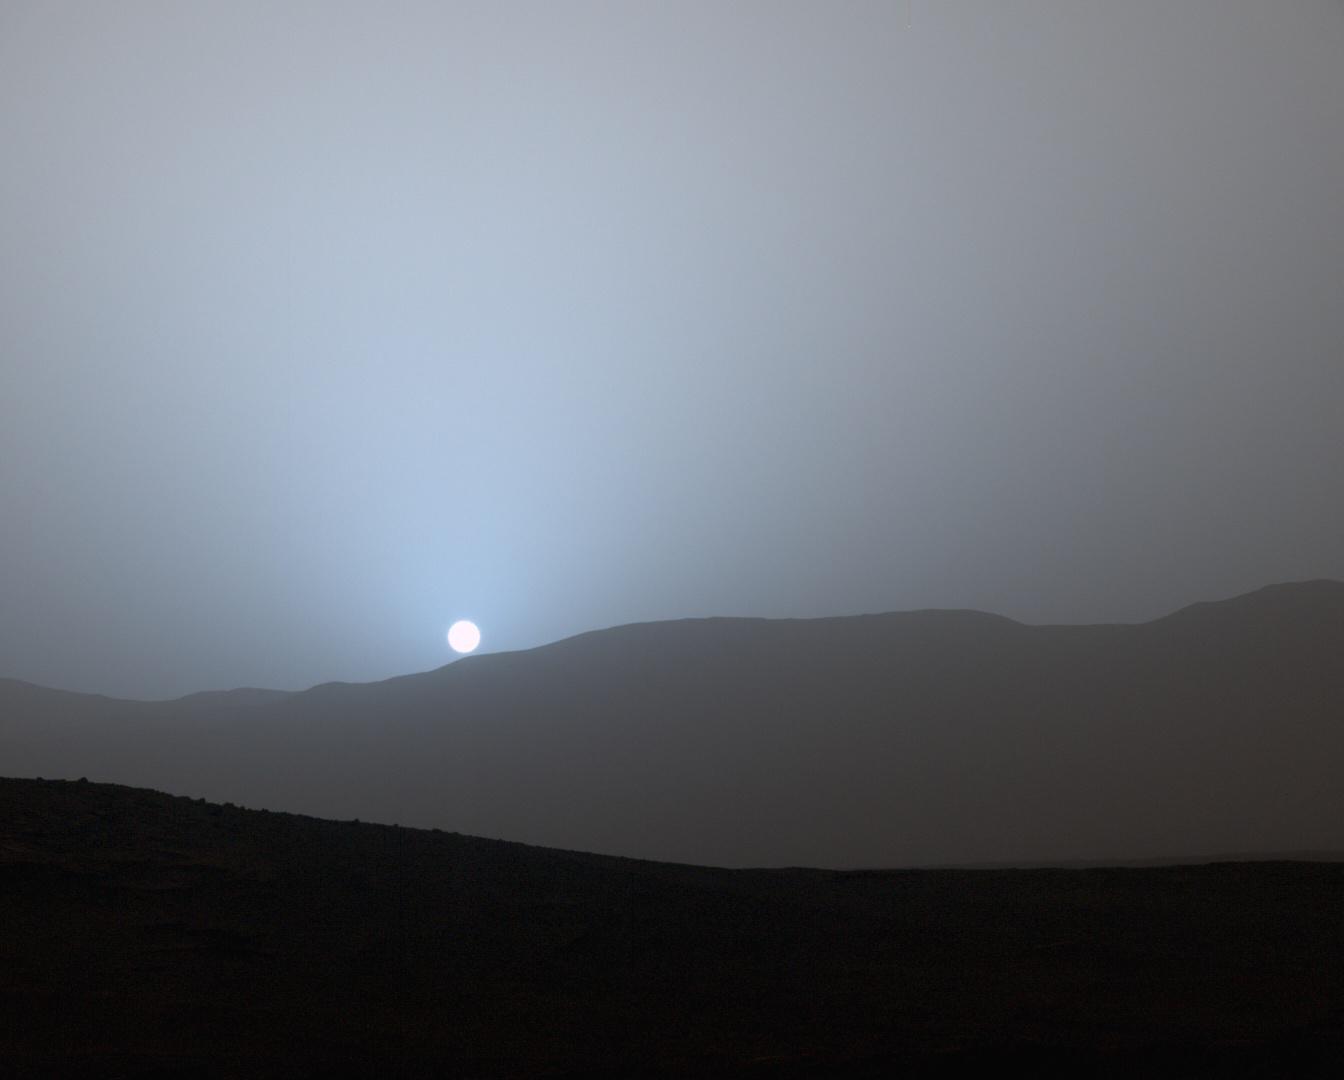 mars sunset rover - photo #11